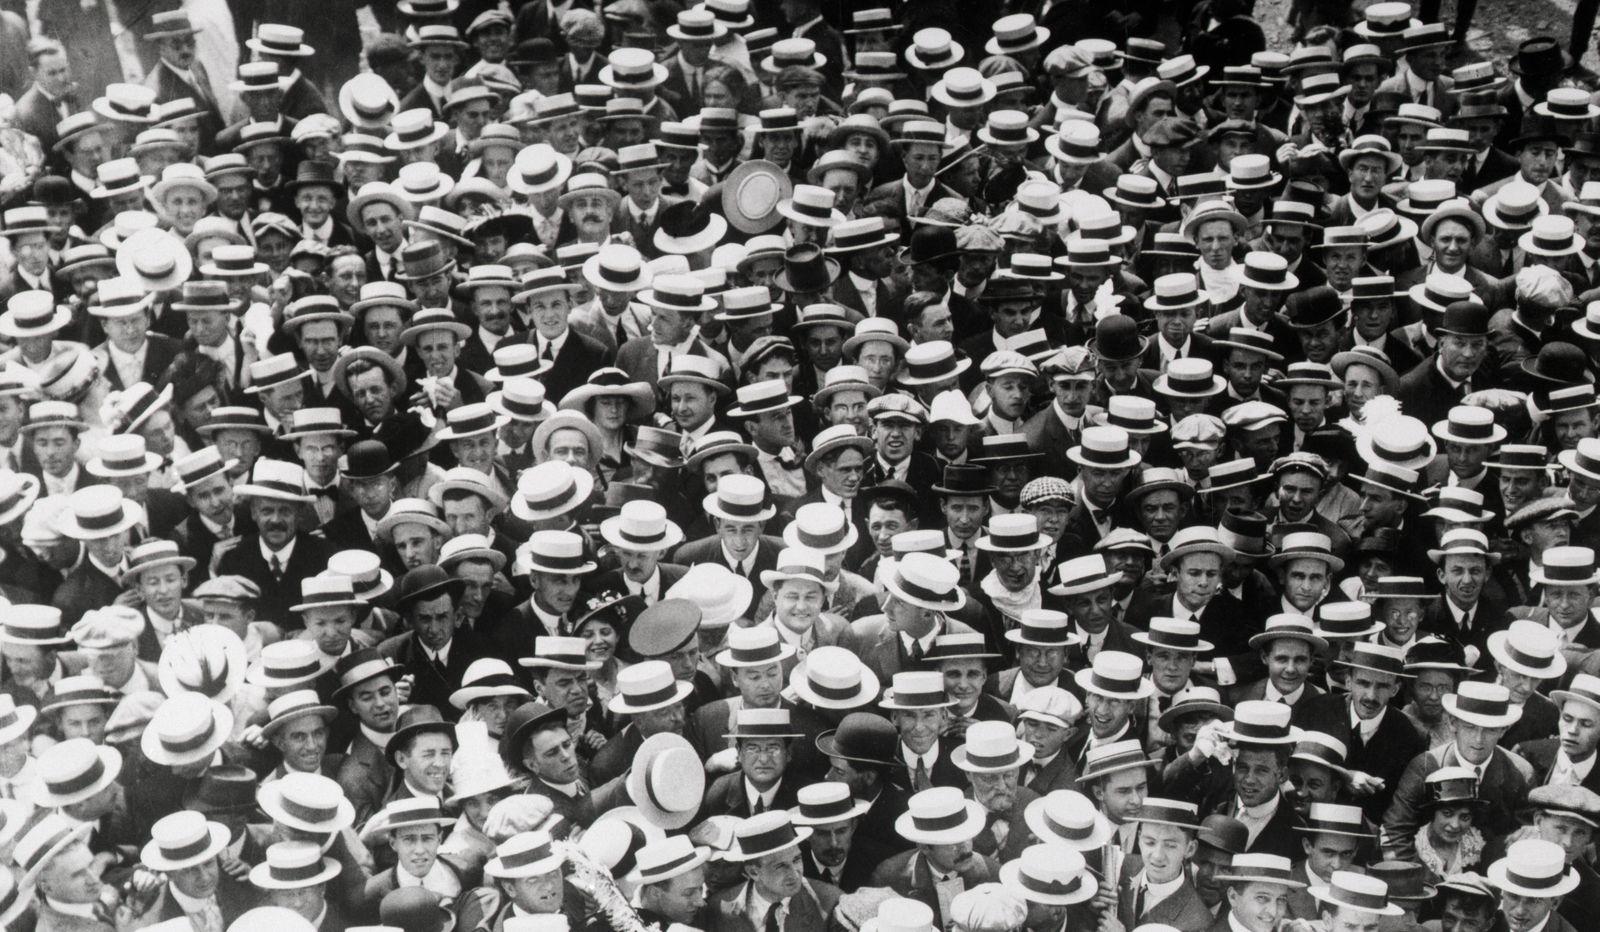 Crowd Scene At Baseball Game